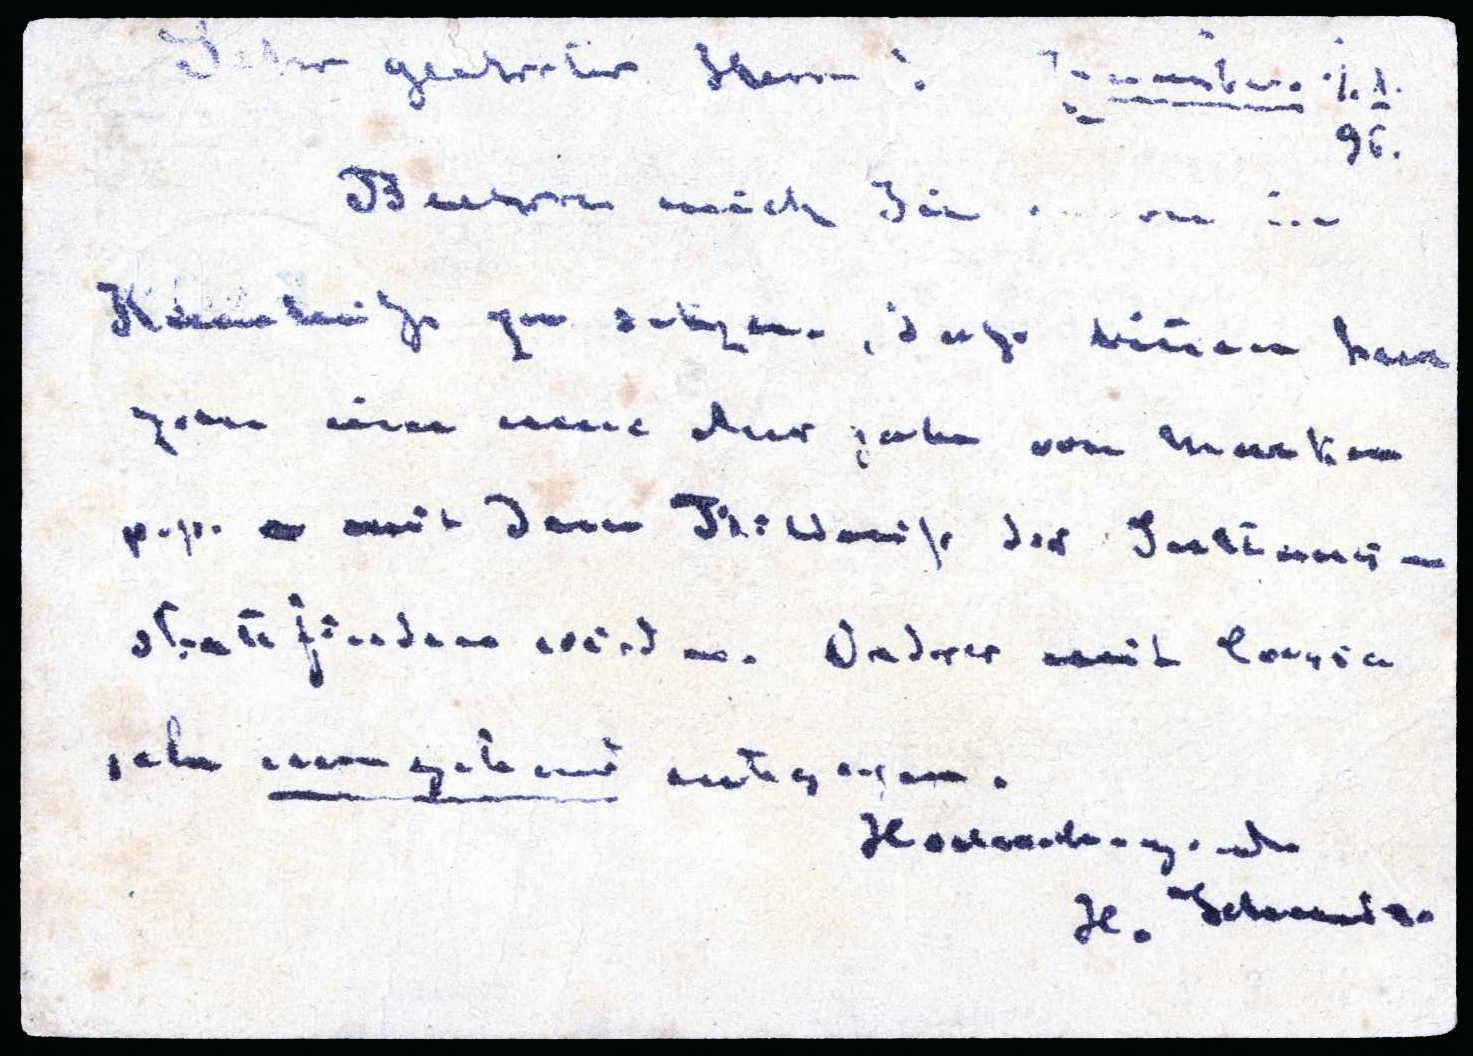 Lot 1782 - andere gebiete sansibar -  HA HARMERS AUCTIONS S.A. Treasure Hunt 3